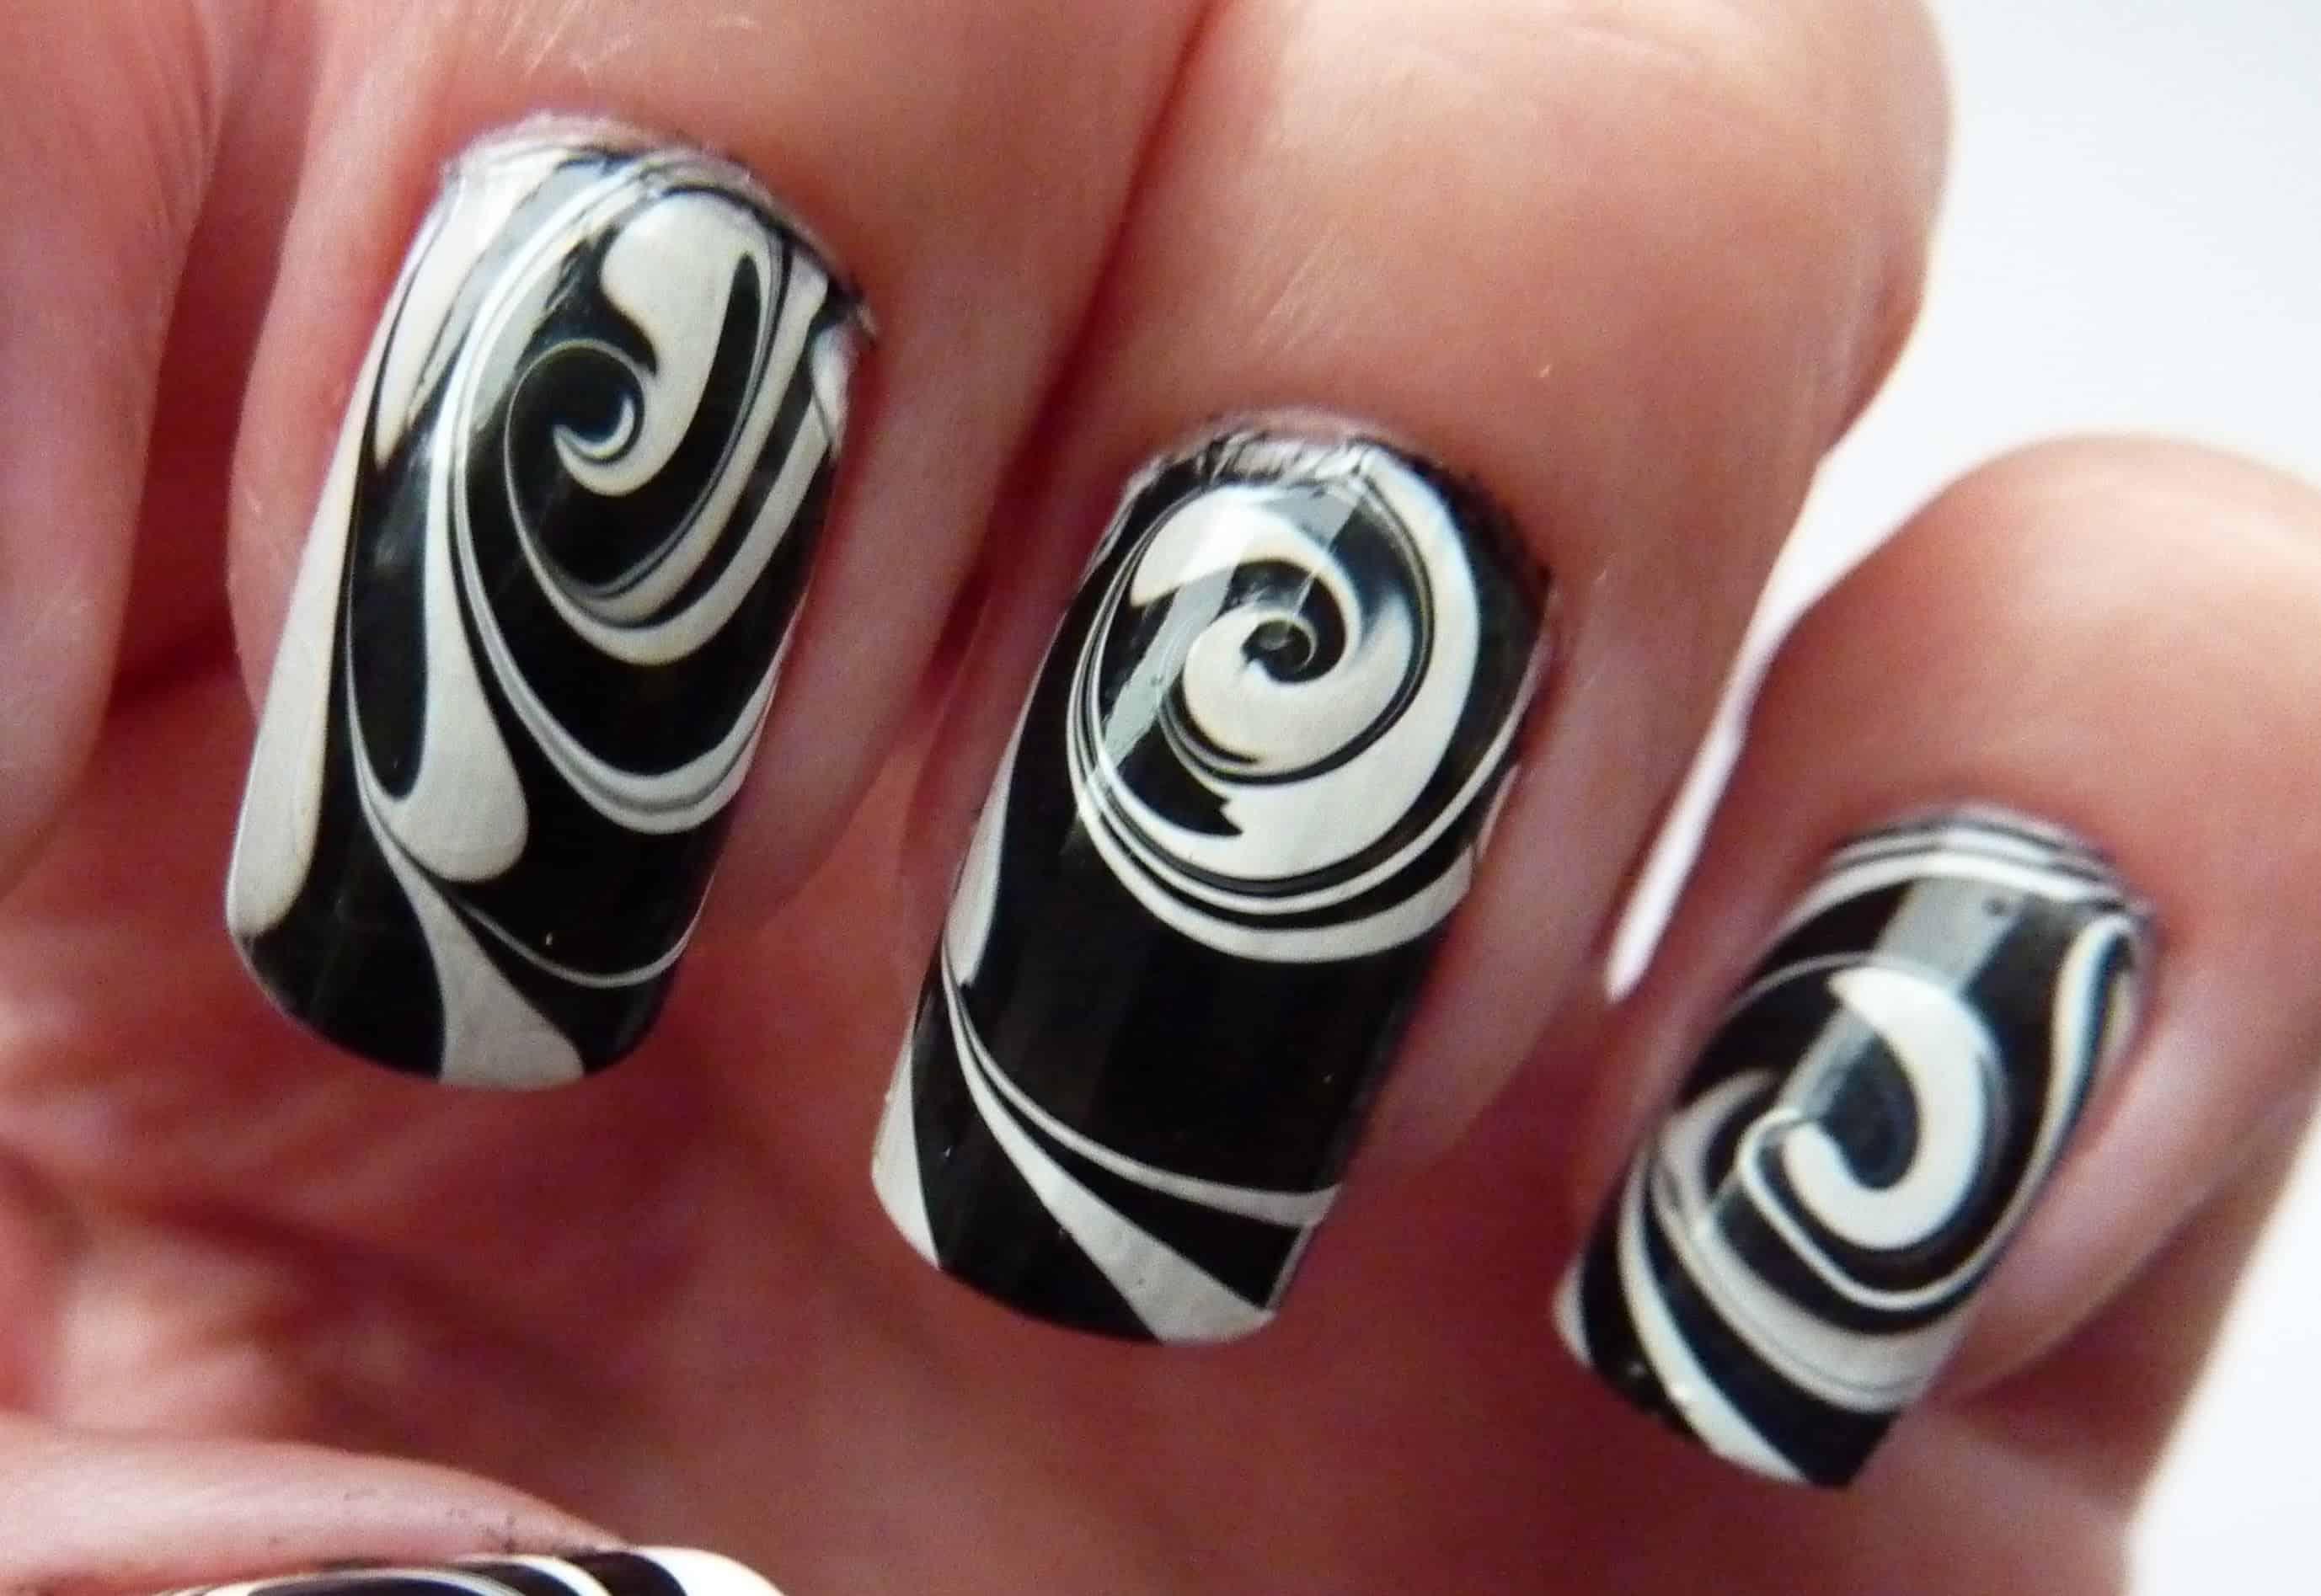 Marble swirl monochrome nails